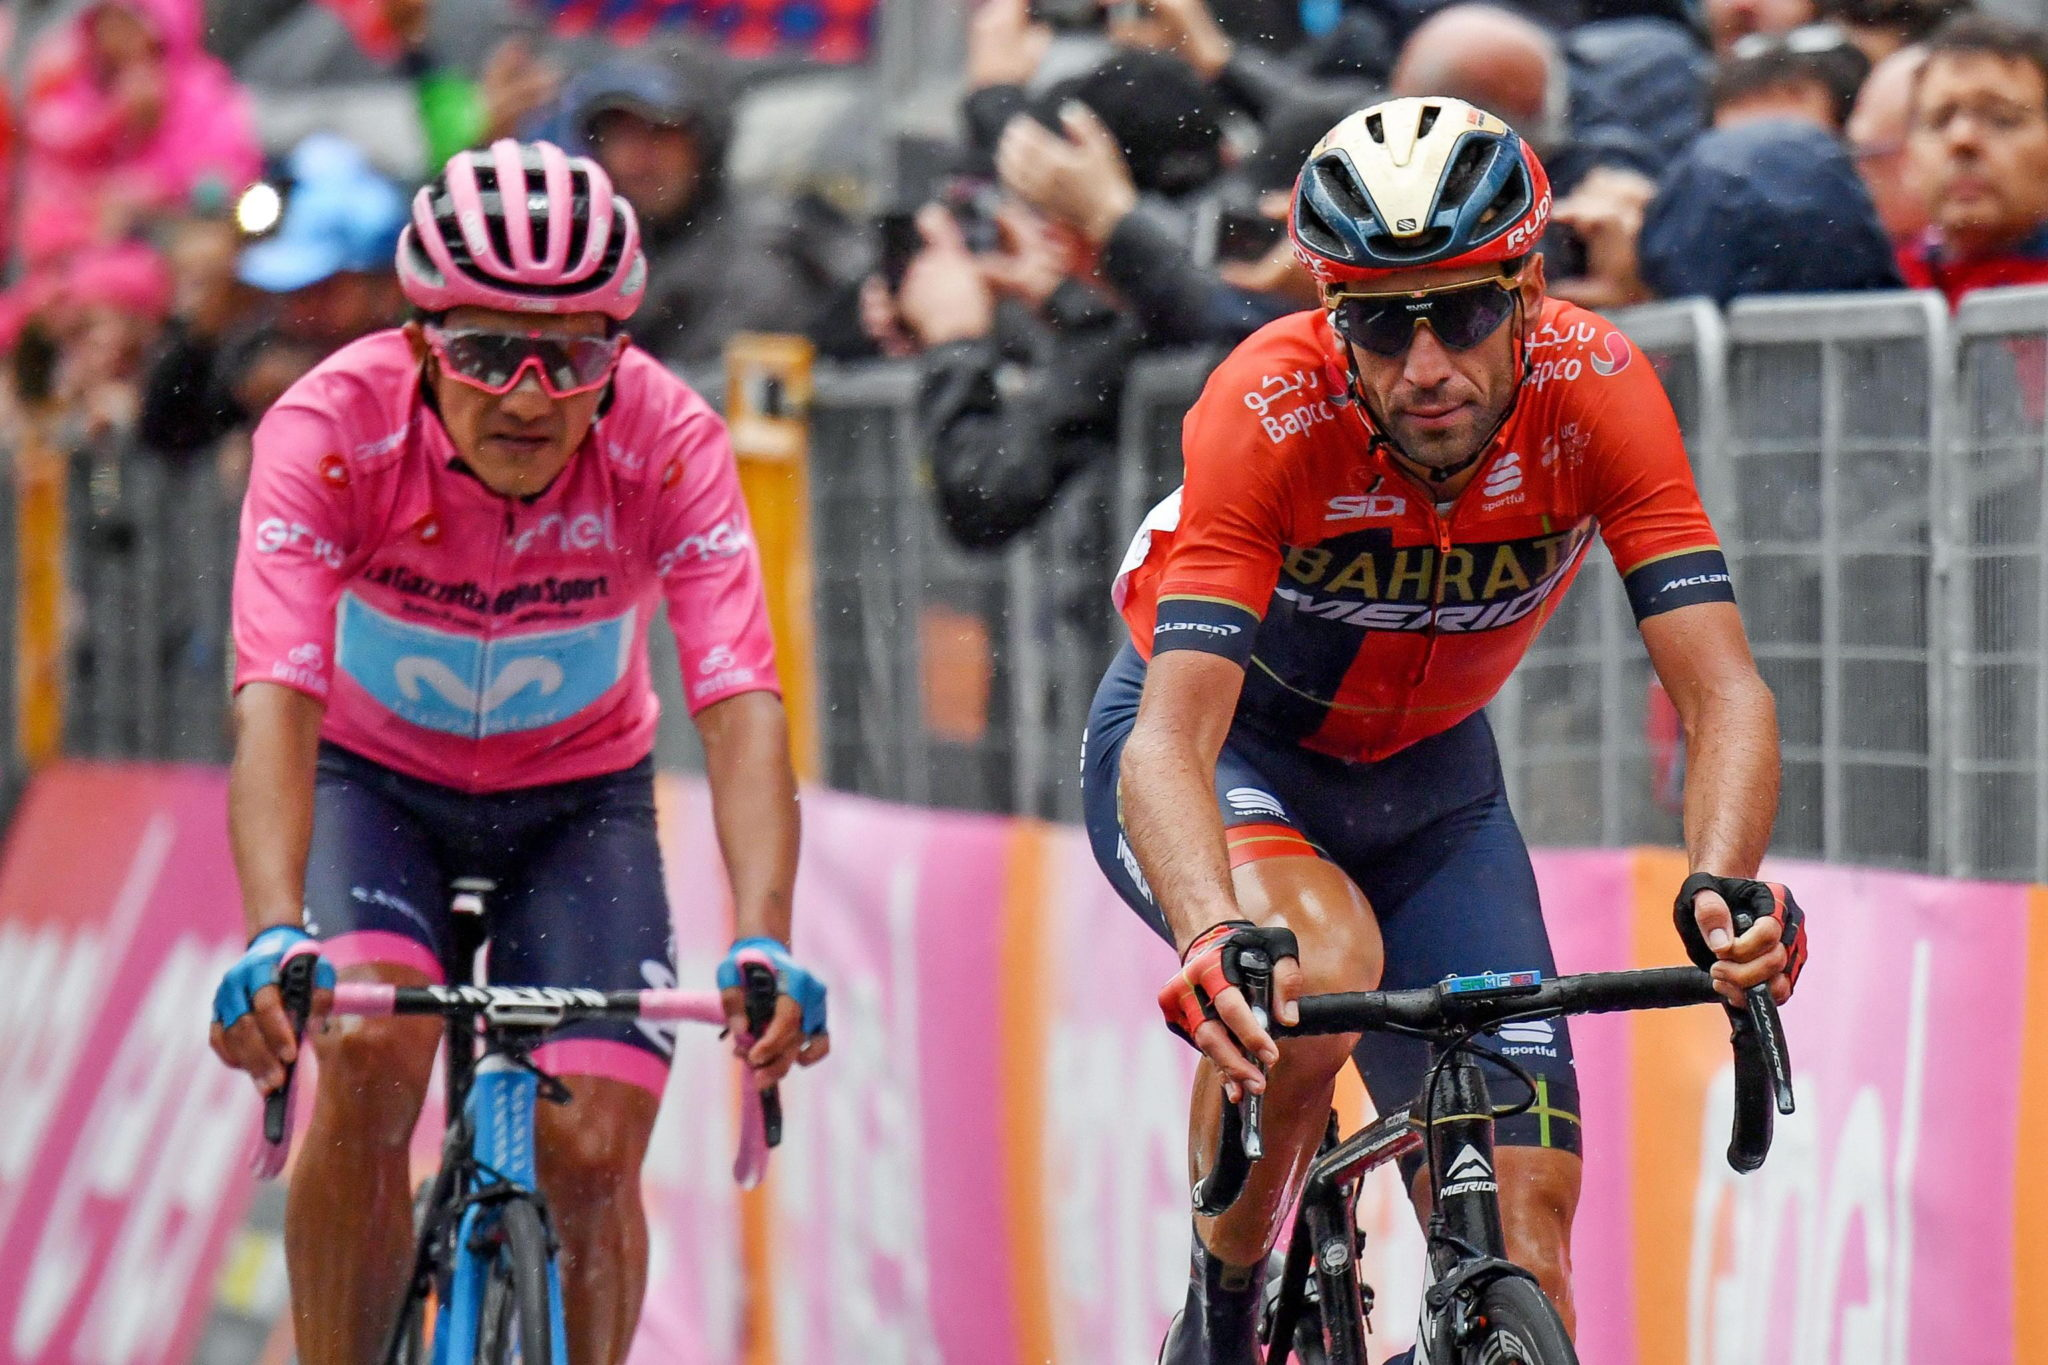 16. etap wyścigu Giro d'Italia, fot. ALESSANDRO DI MEO, PAP/EPA.